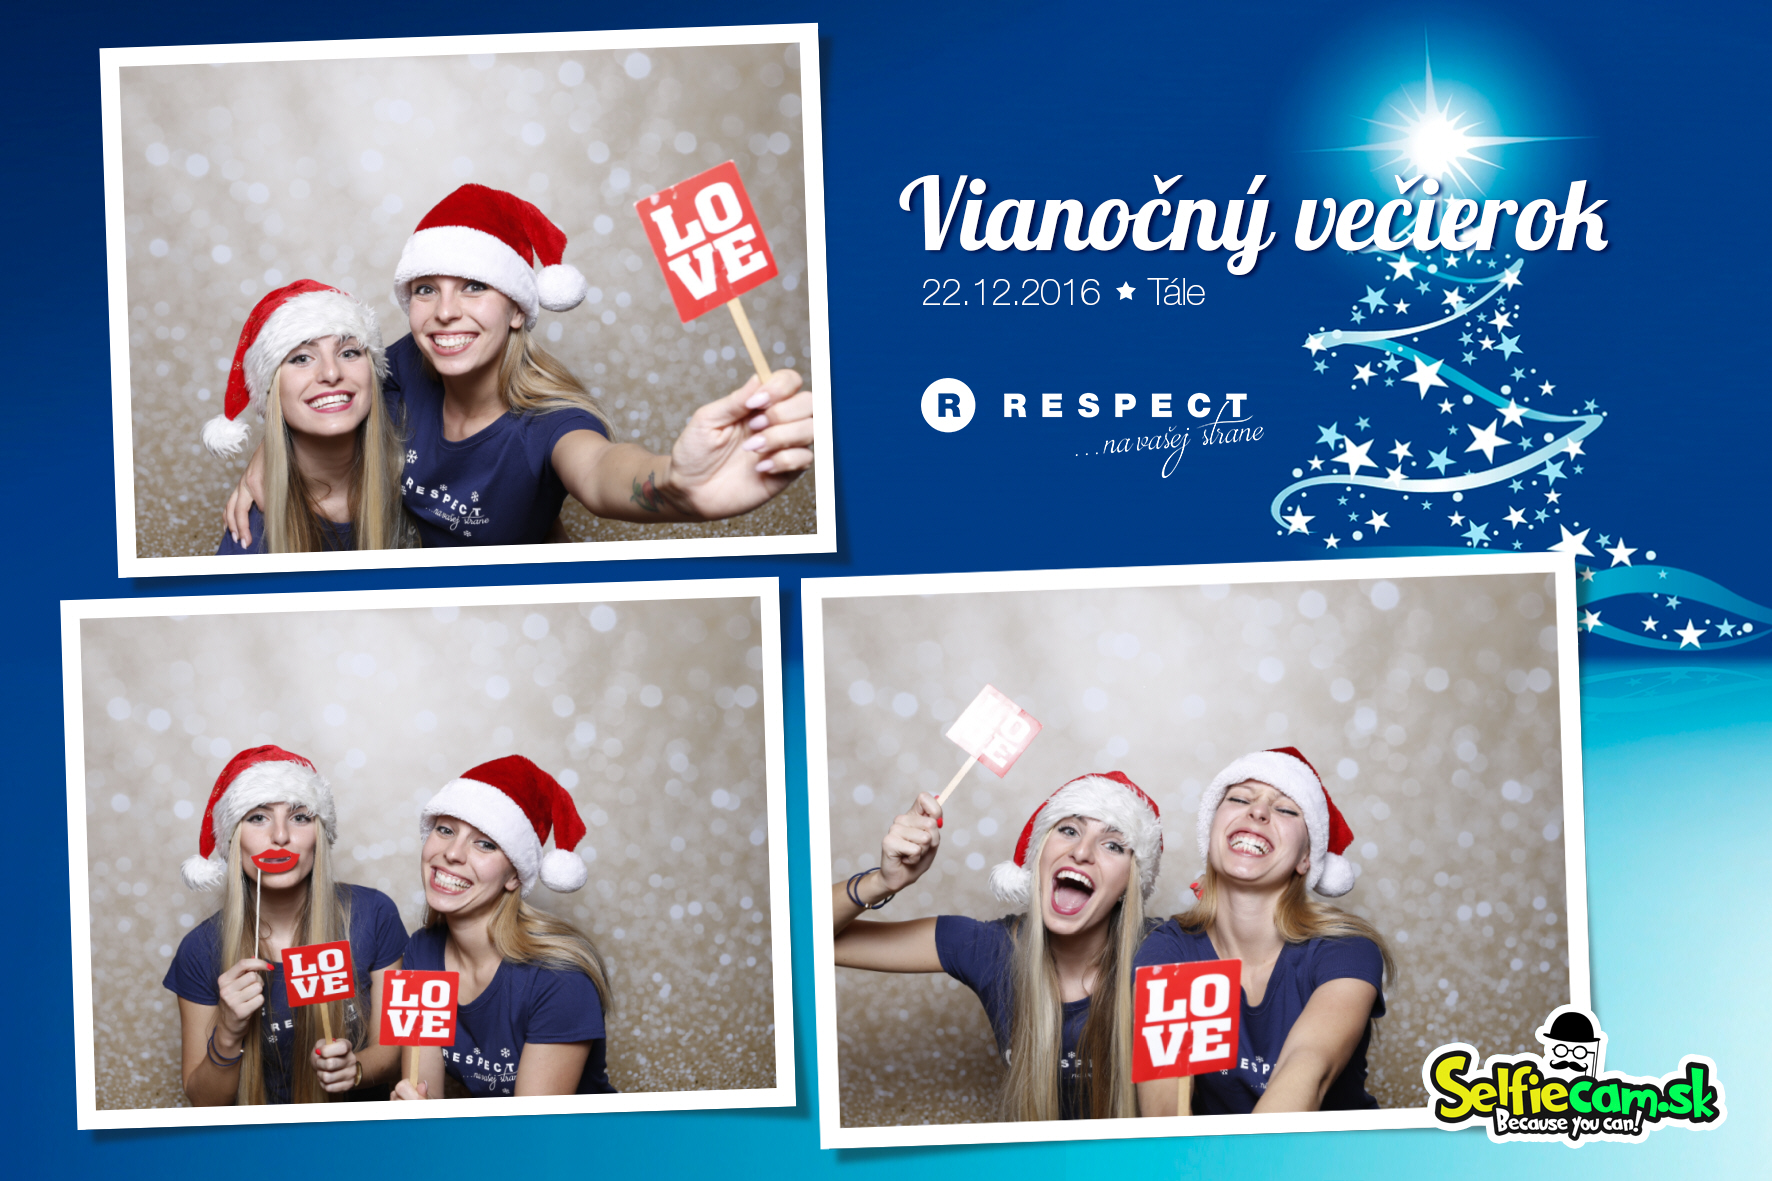 selfiecam-16-12-22-respect-slovakia-vianoce-134